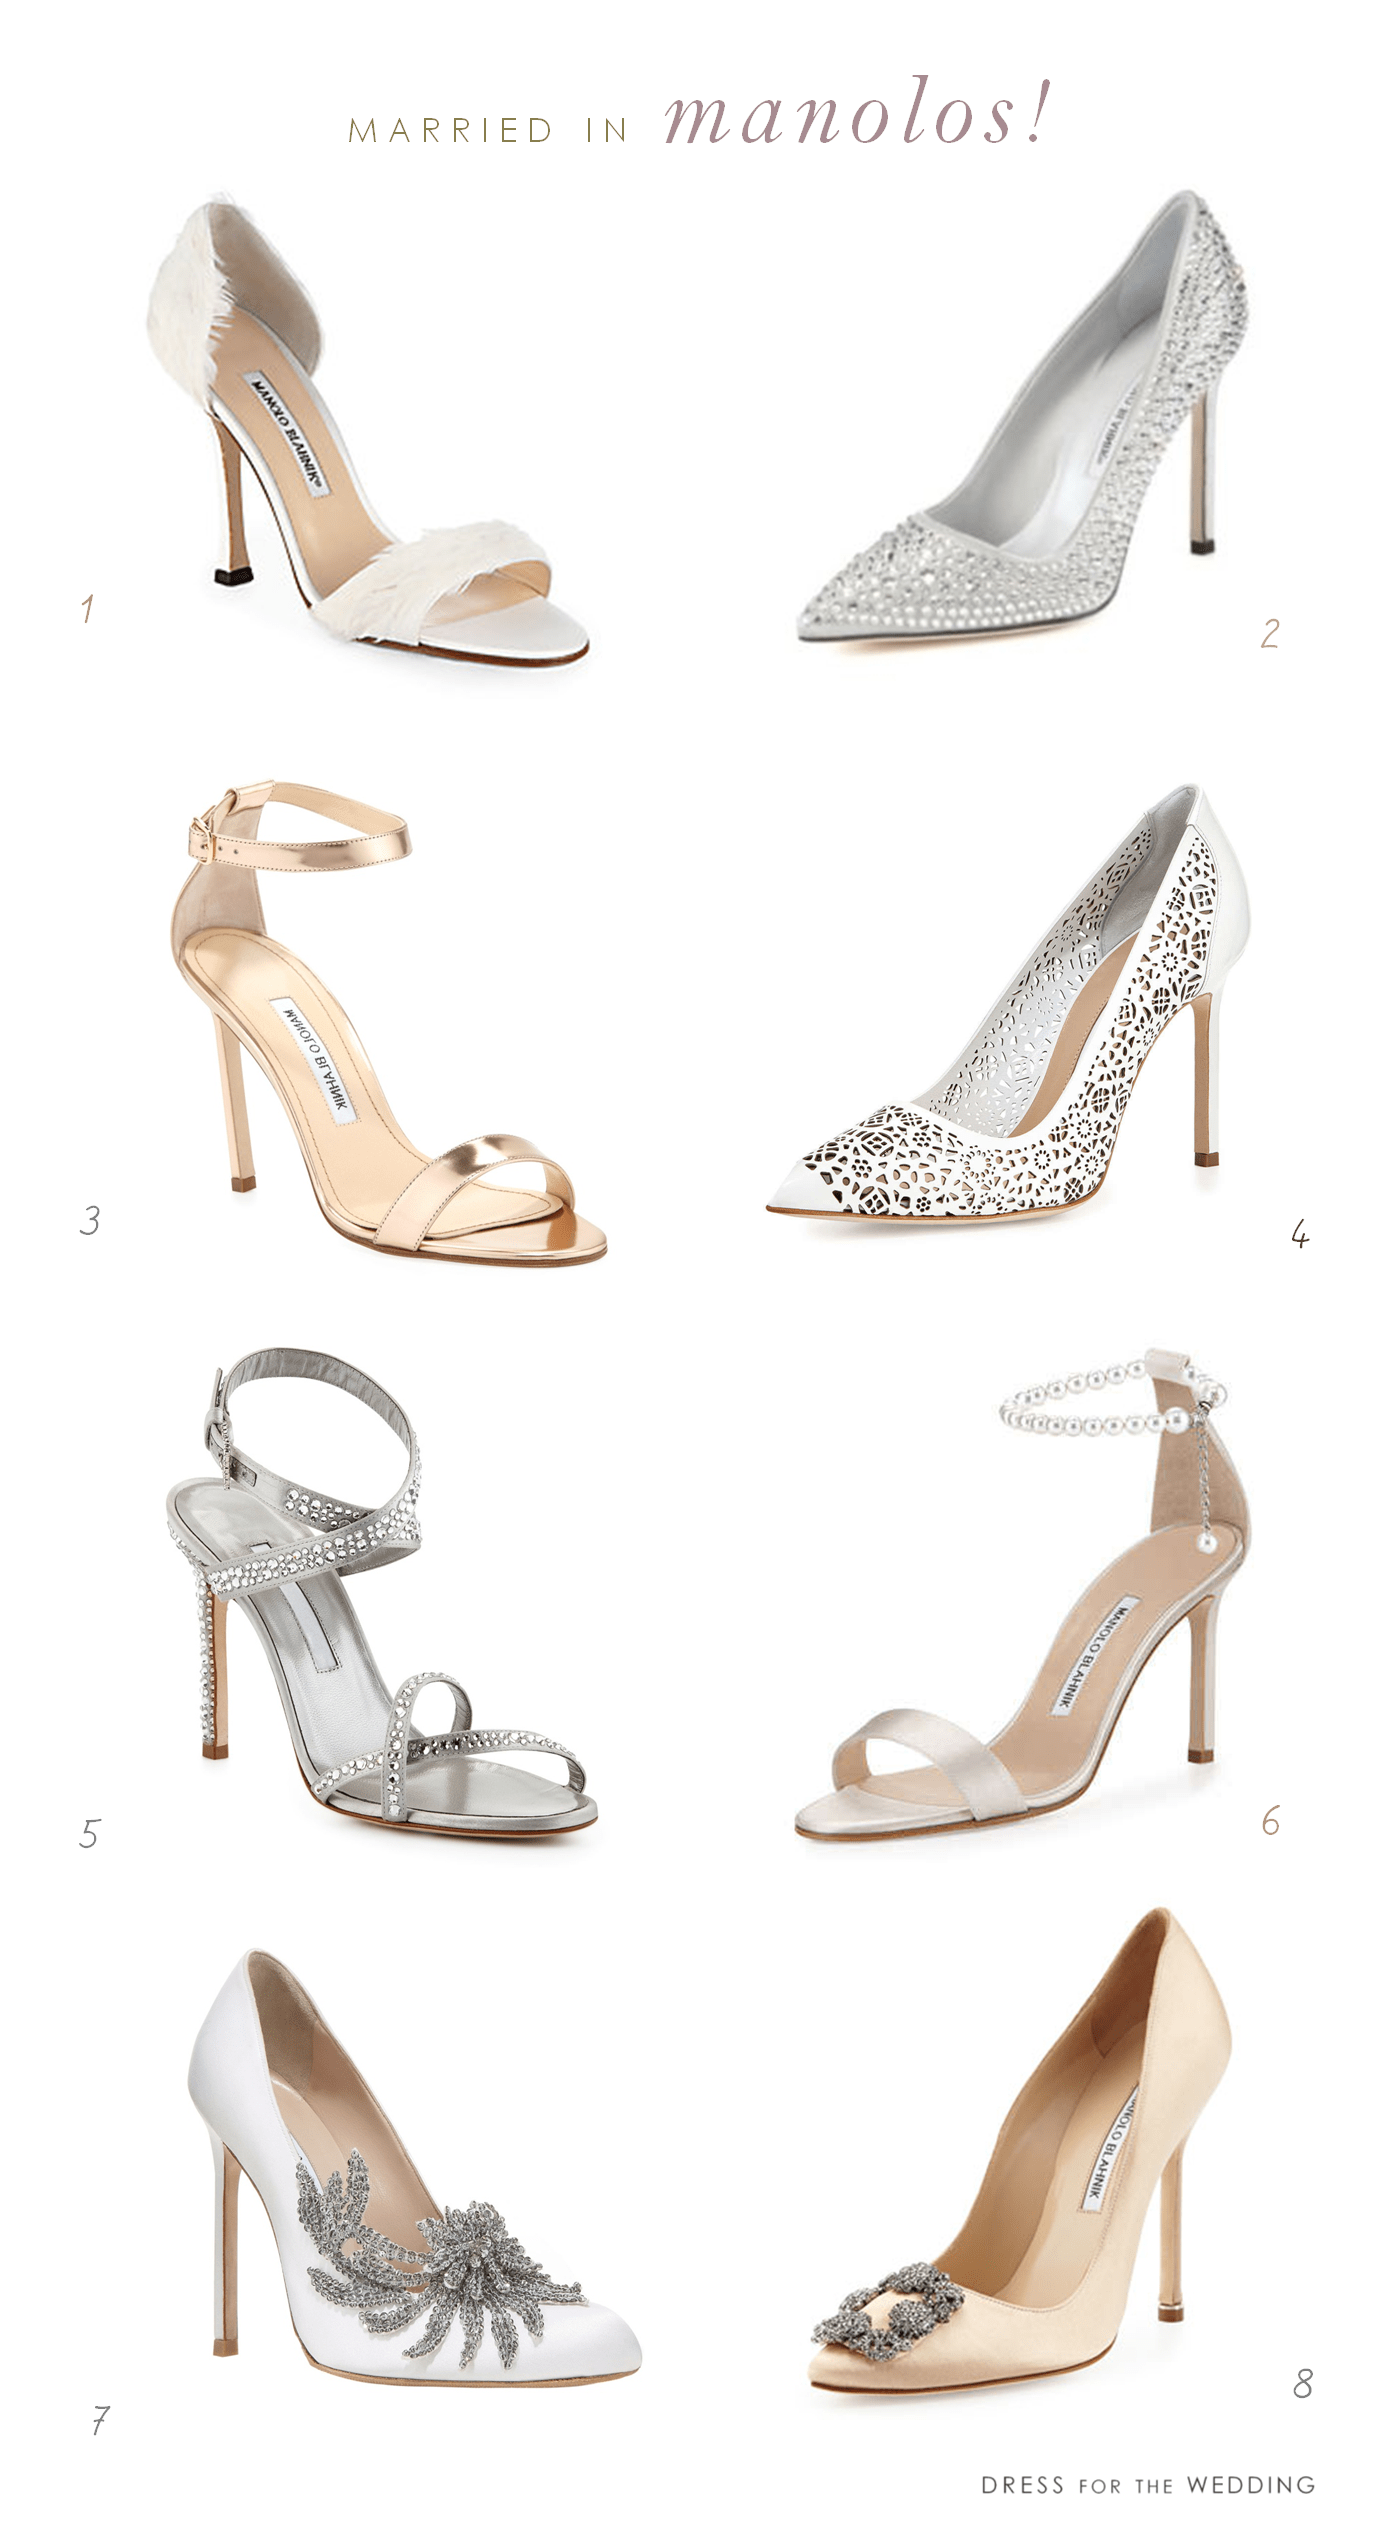 Wedding Shoes By Manolo Blahnik